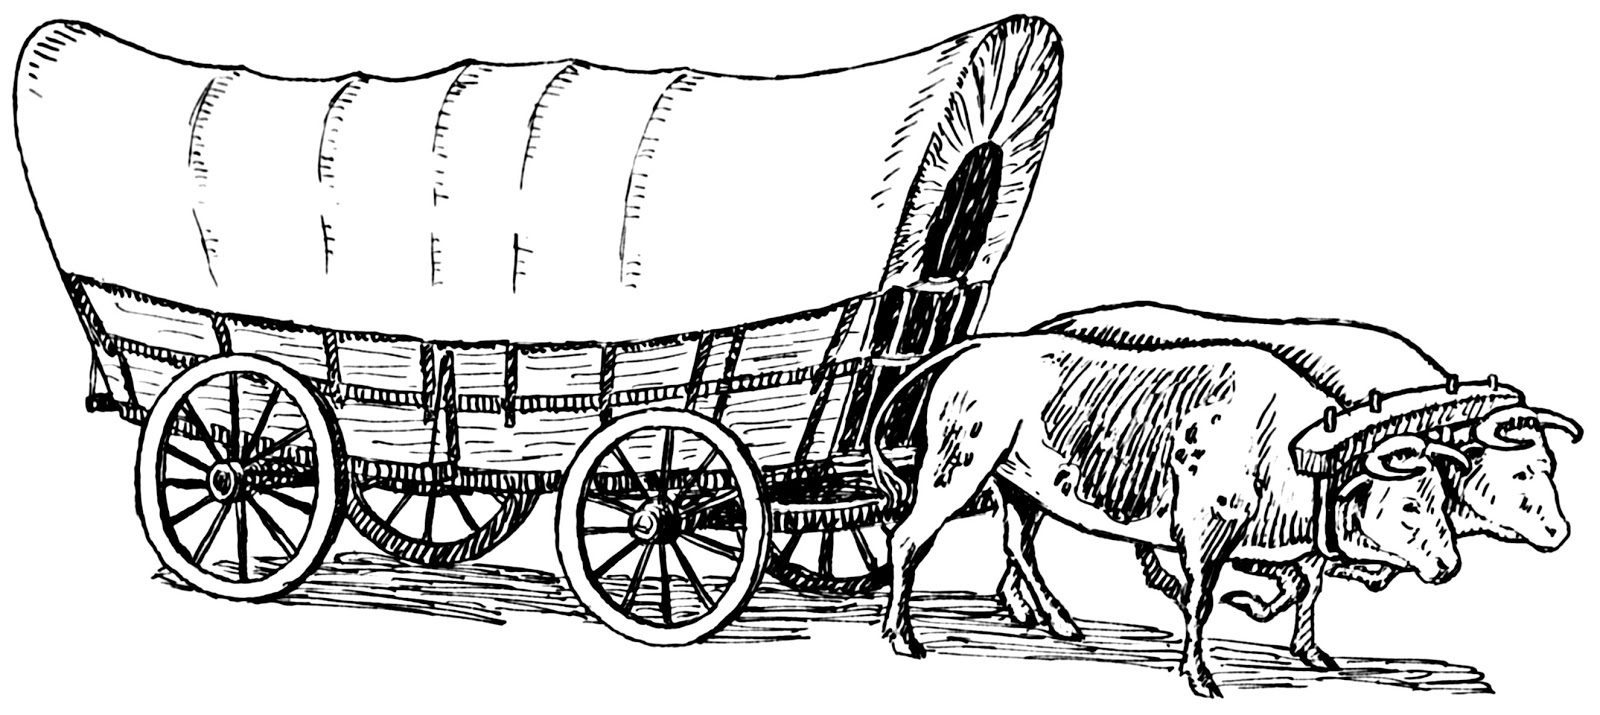 Wild West clipart westward expansion Built The Wagons Prairie Travel